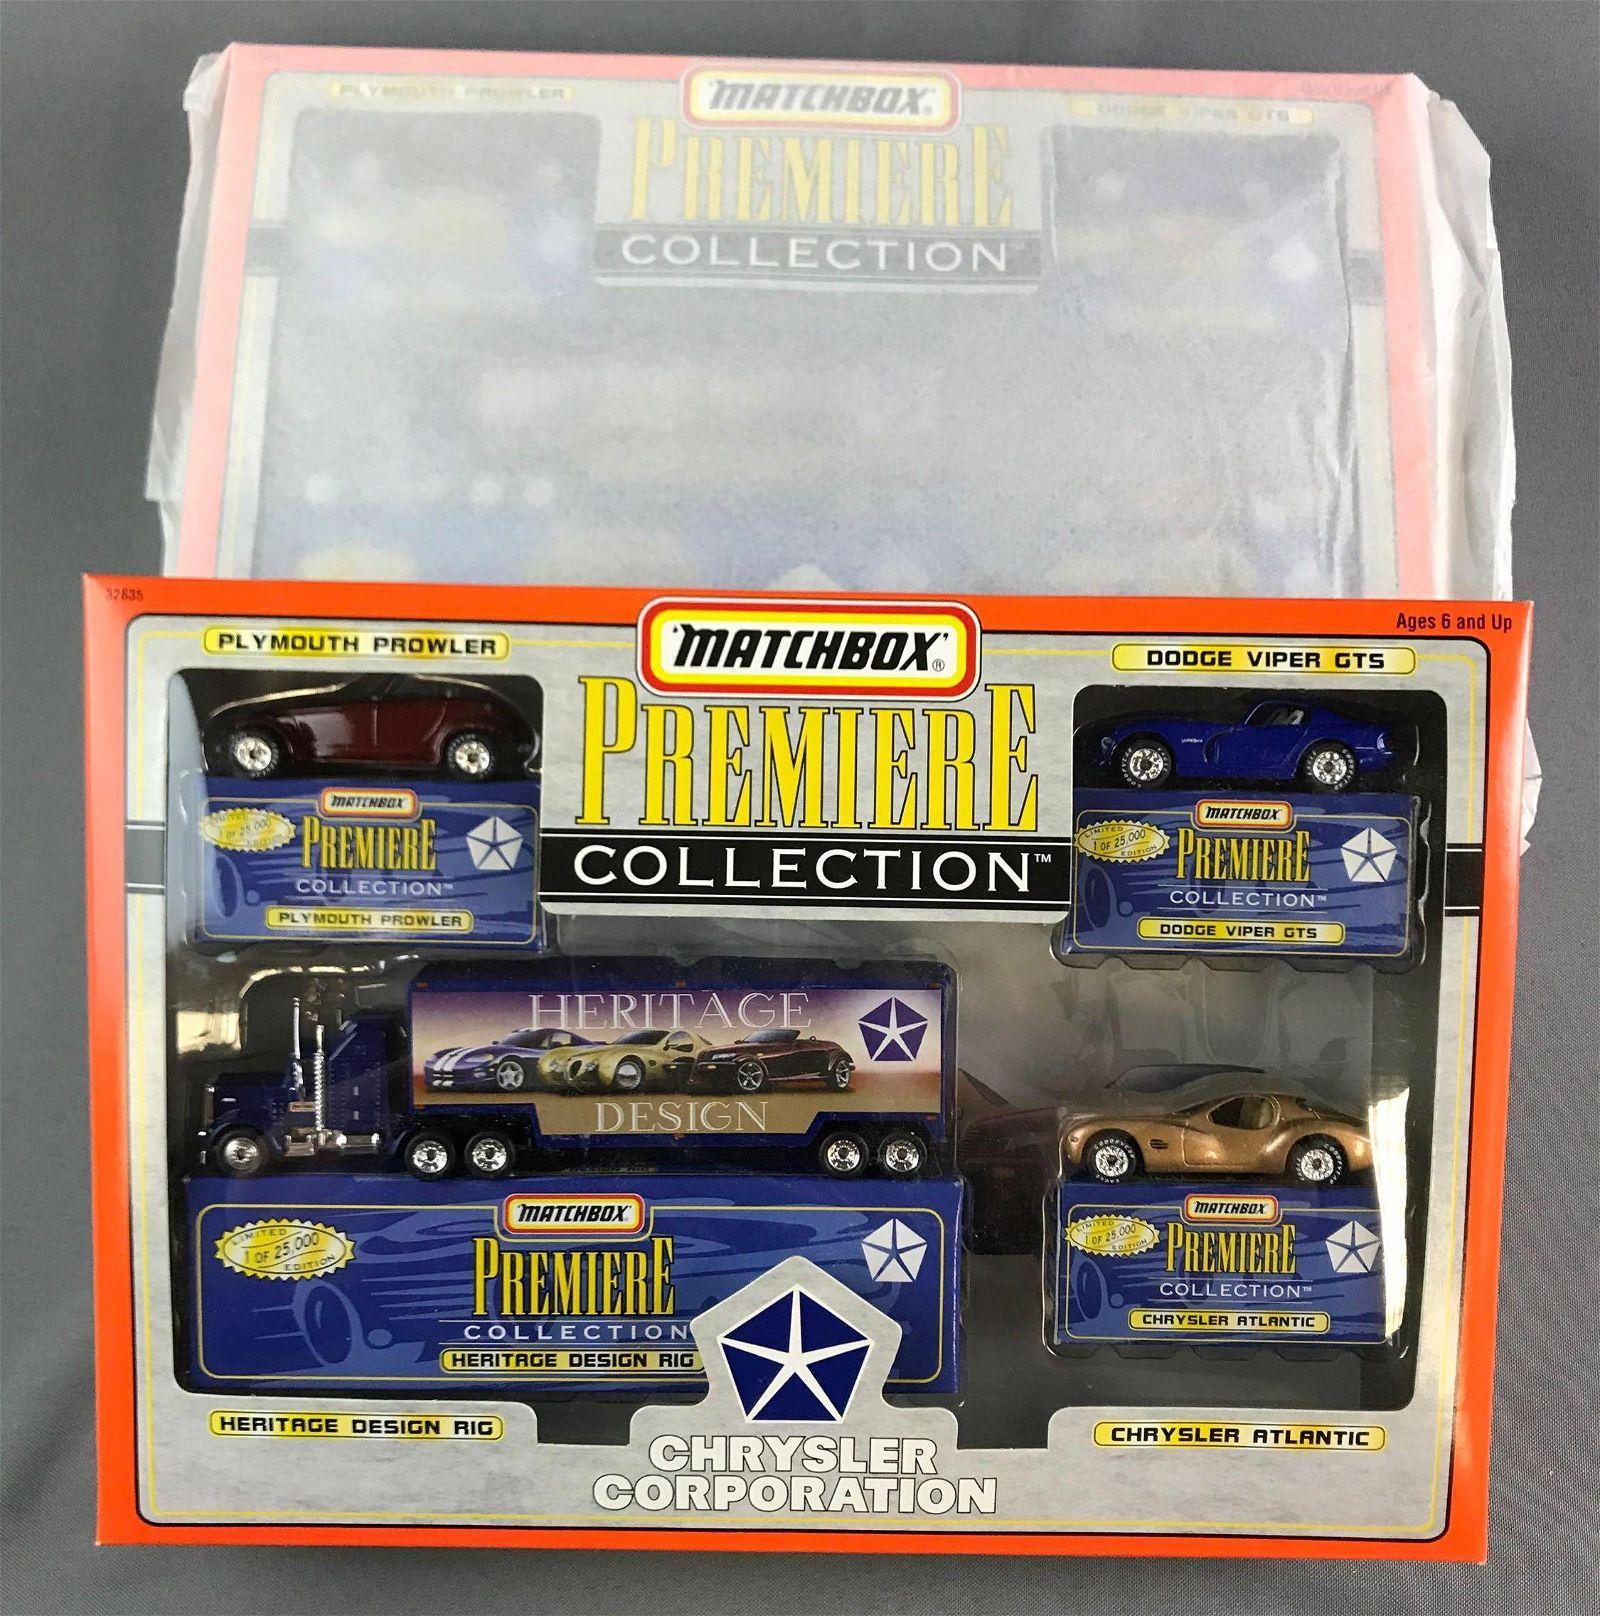 Matchbox Premier Collection Die Cast Vehicle Gift Sets